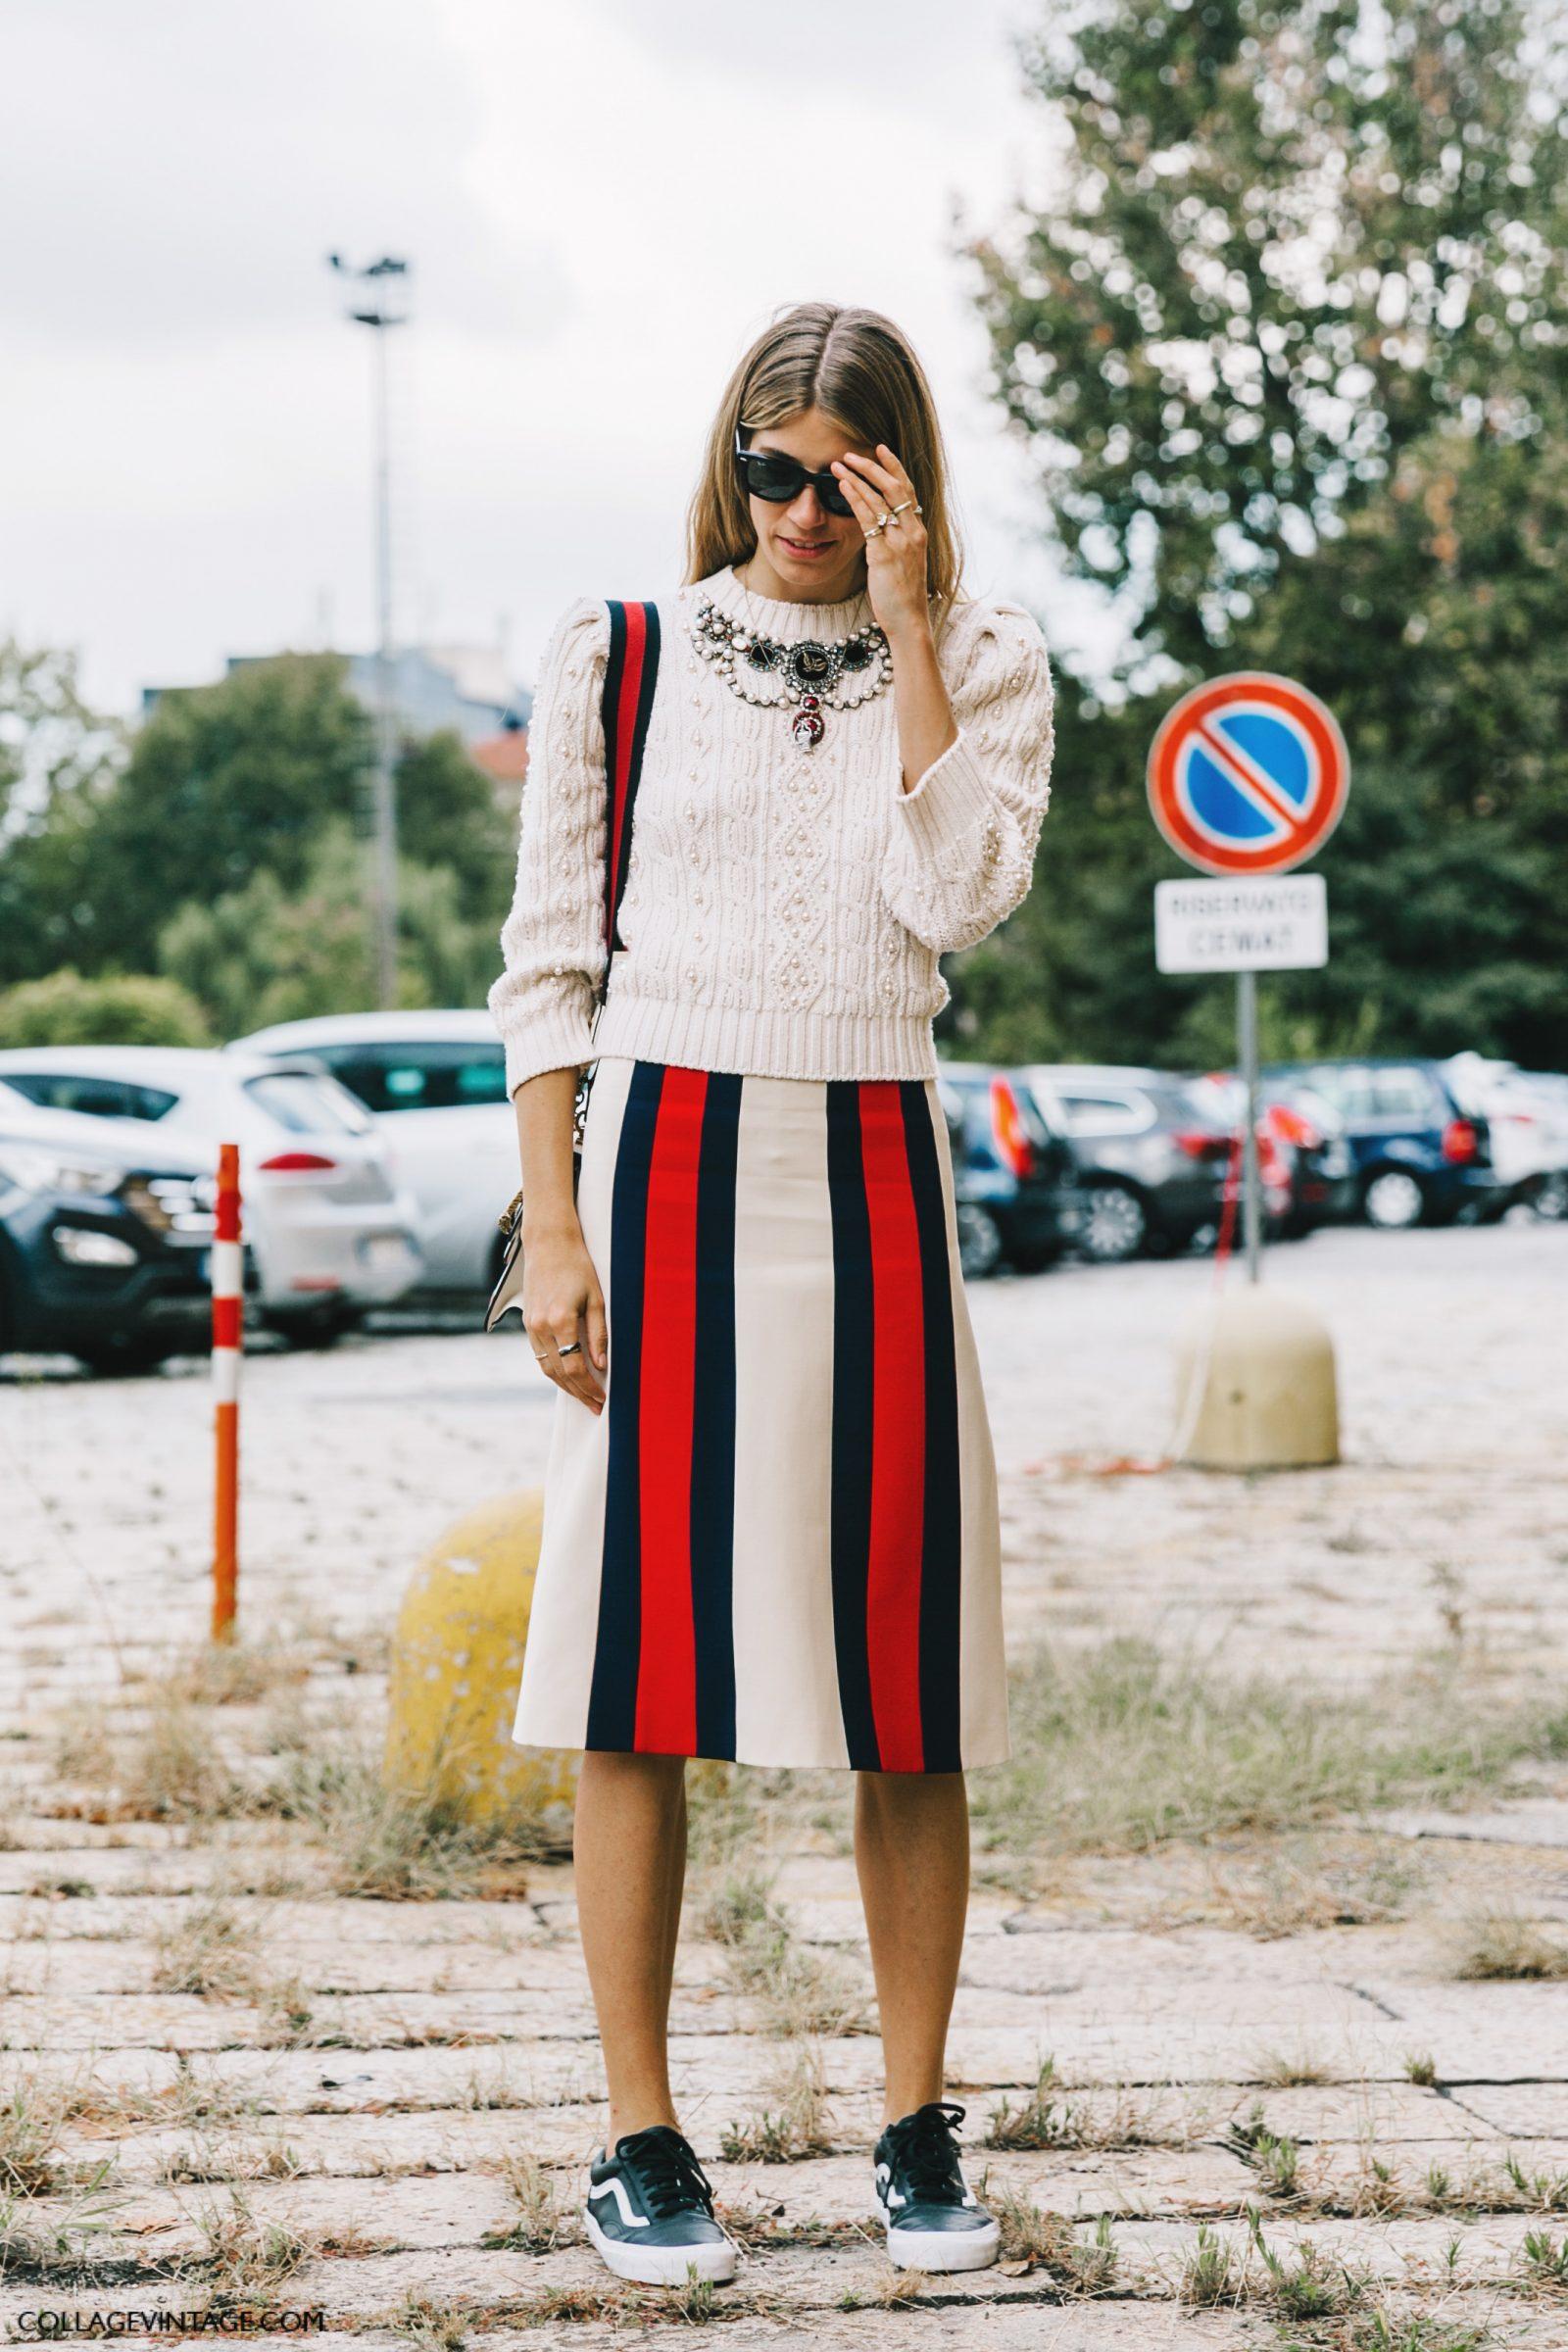 mfw-milan_fashion_week_ss17-street_style-outfits-collage_vintage-gucci-numero_21-alberta_ferreti-112